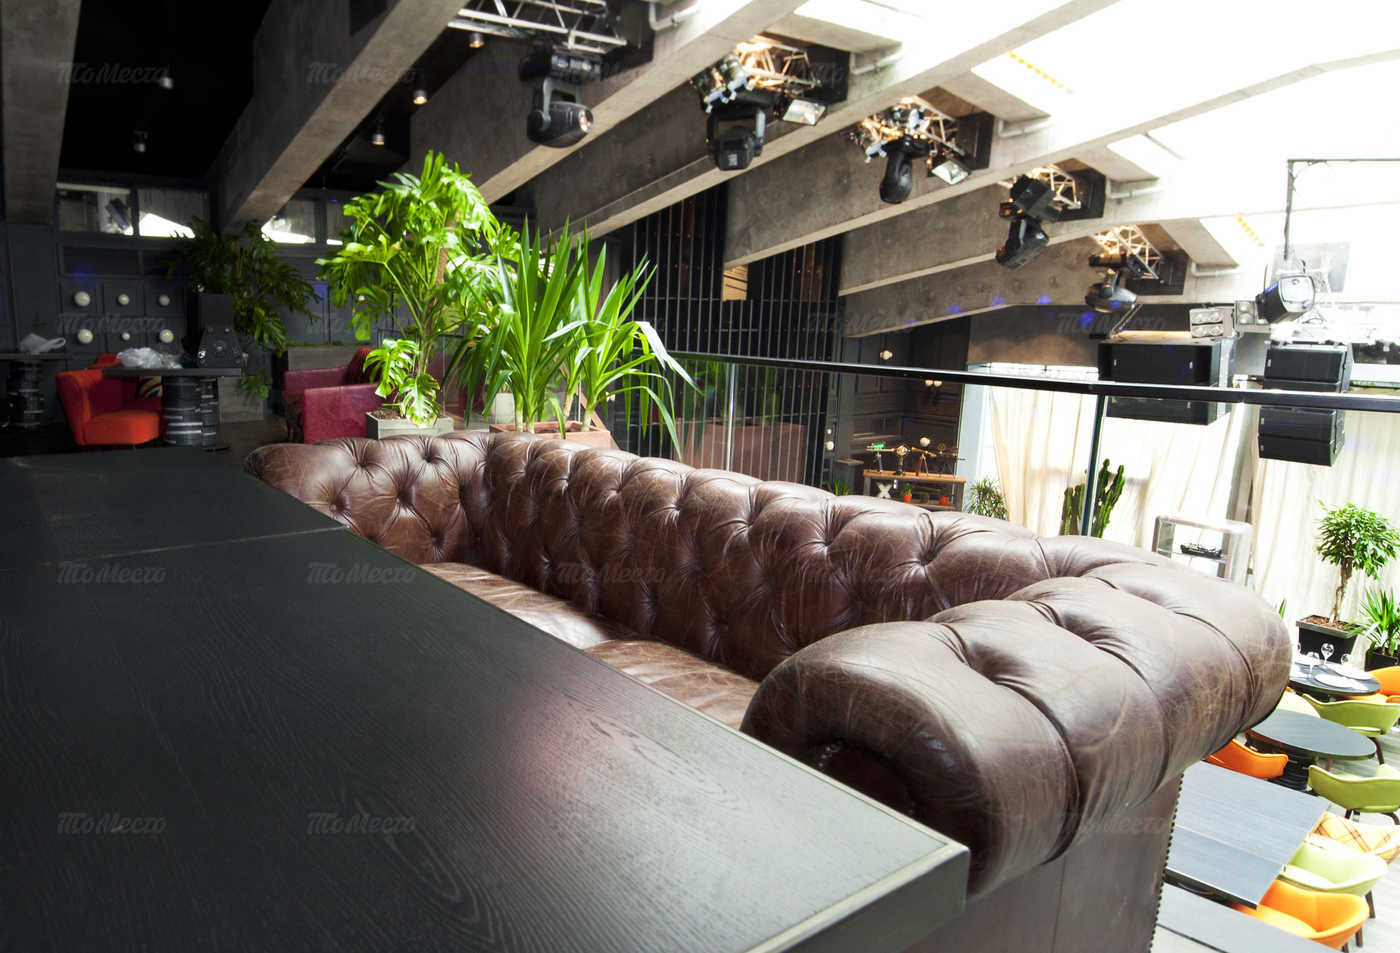 Меню бара, ресторана Maxim Bar (Максим Бар) на Цветном бульваре